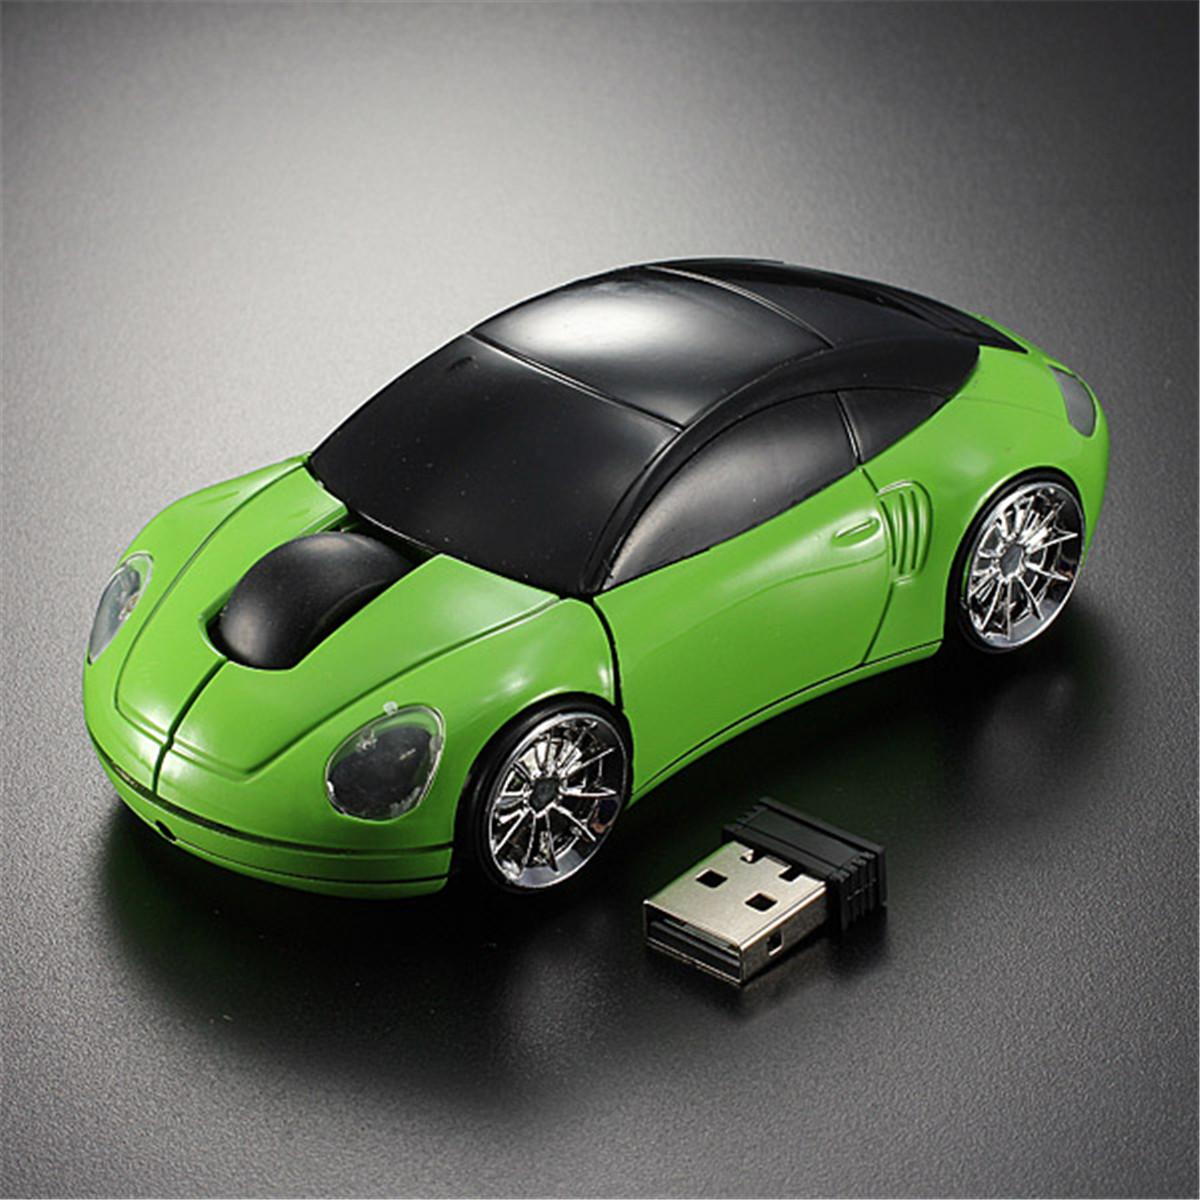 USB Wireless Optical Mouse 2.4GHz 1600DPI 3D Car Shape Mice for usbmouse Laptop PC